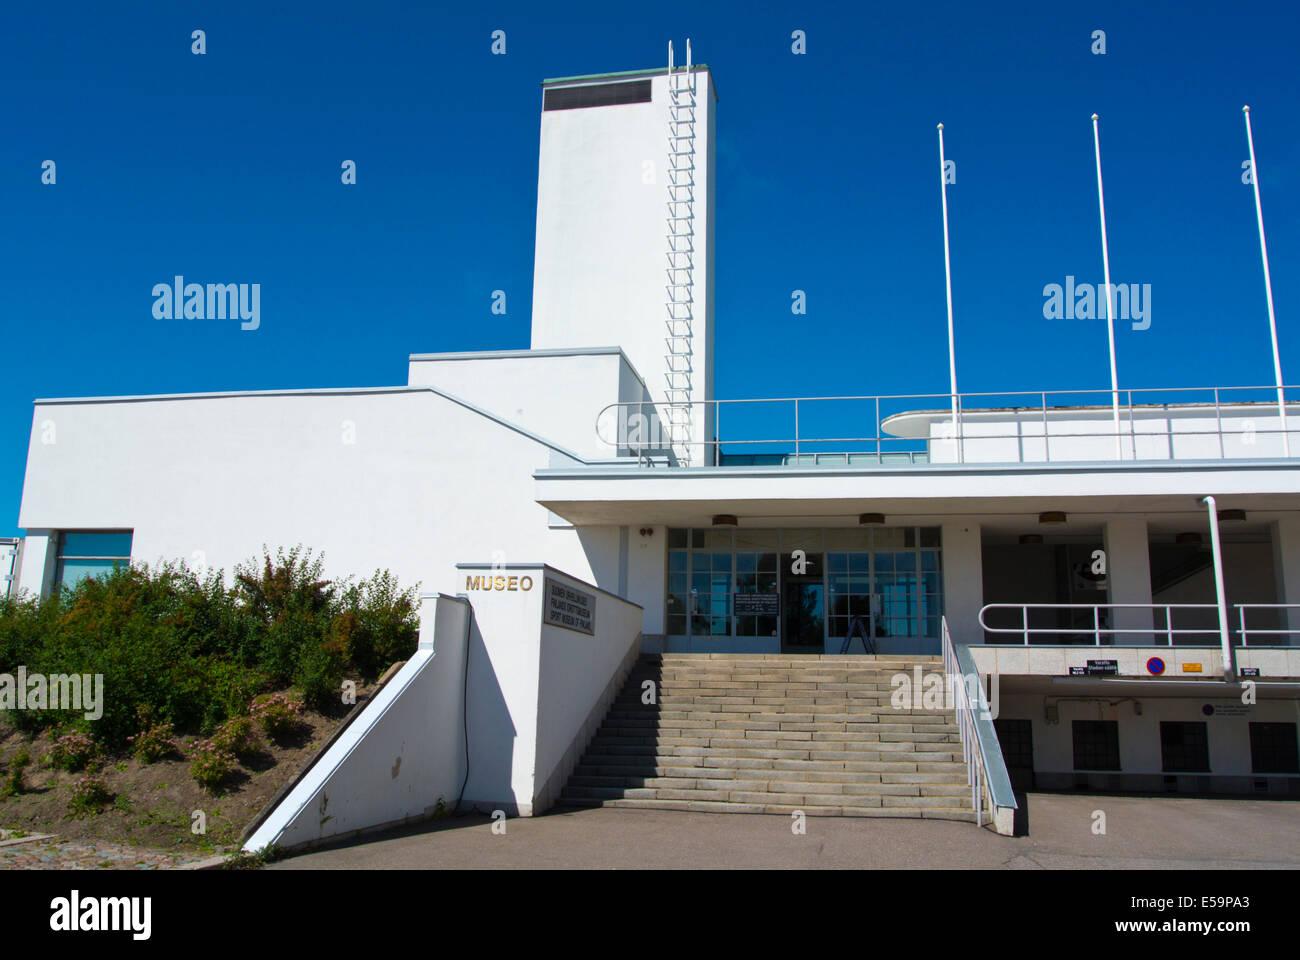 Urheilumuseo, Sports museum, Olympiastadion, the Olympic Stadium, Taka-Töölö district, central Helsinki, - Stock Image